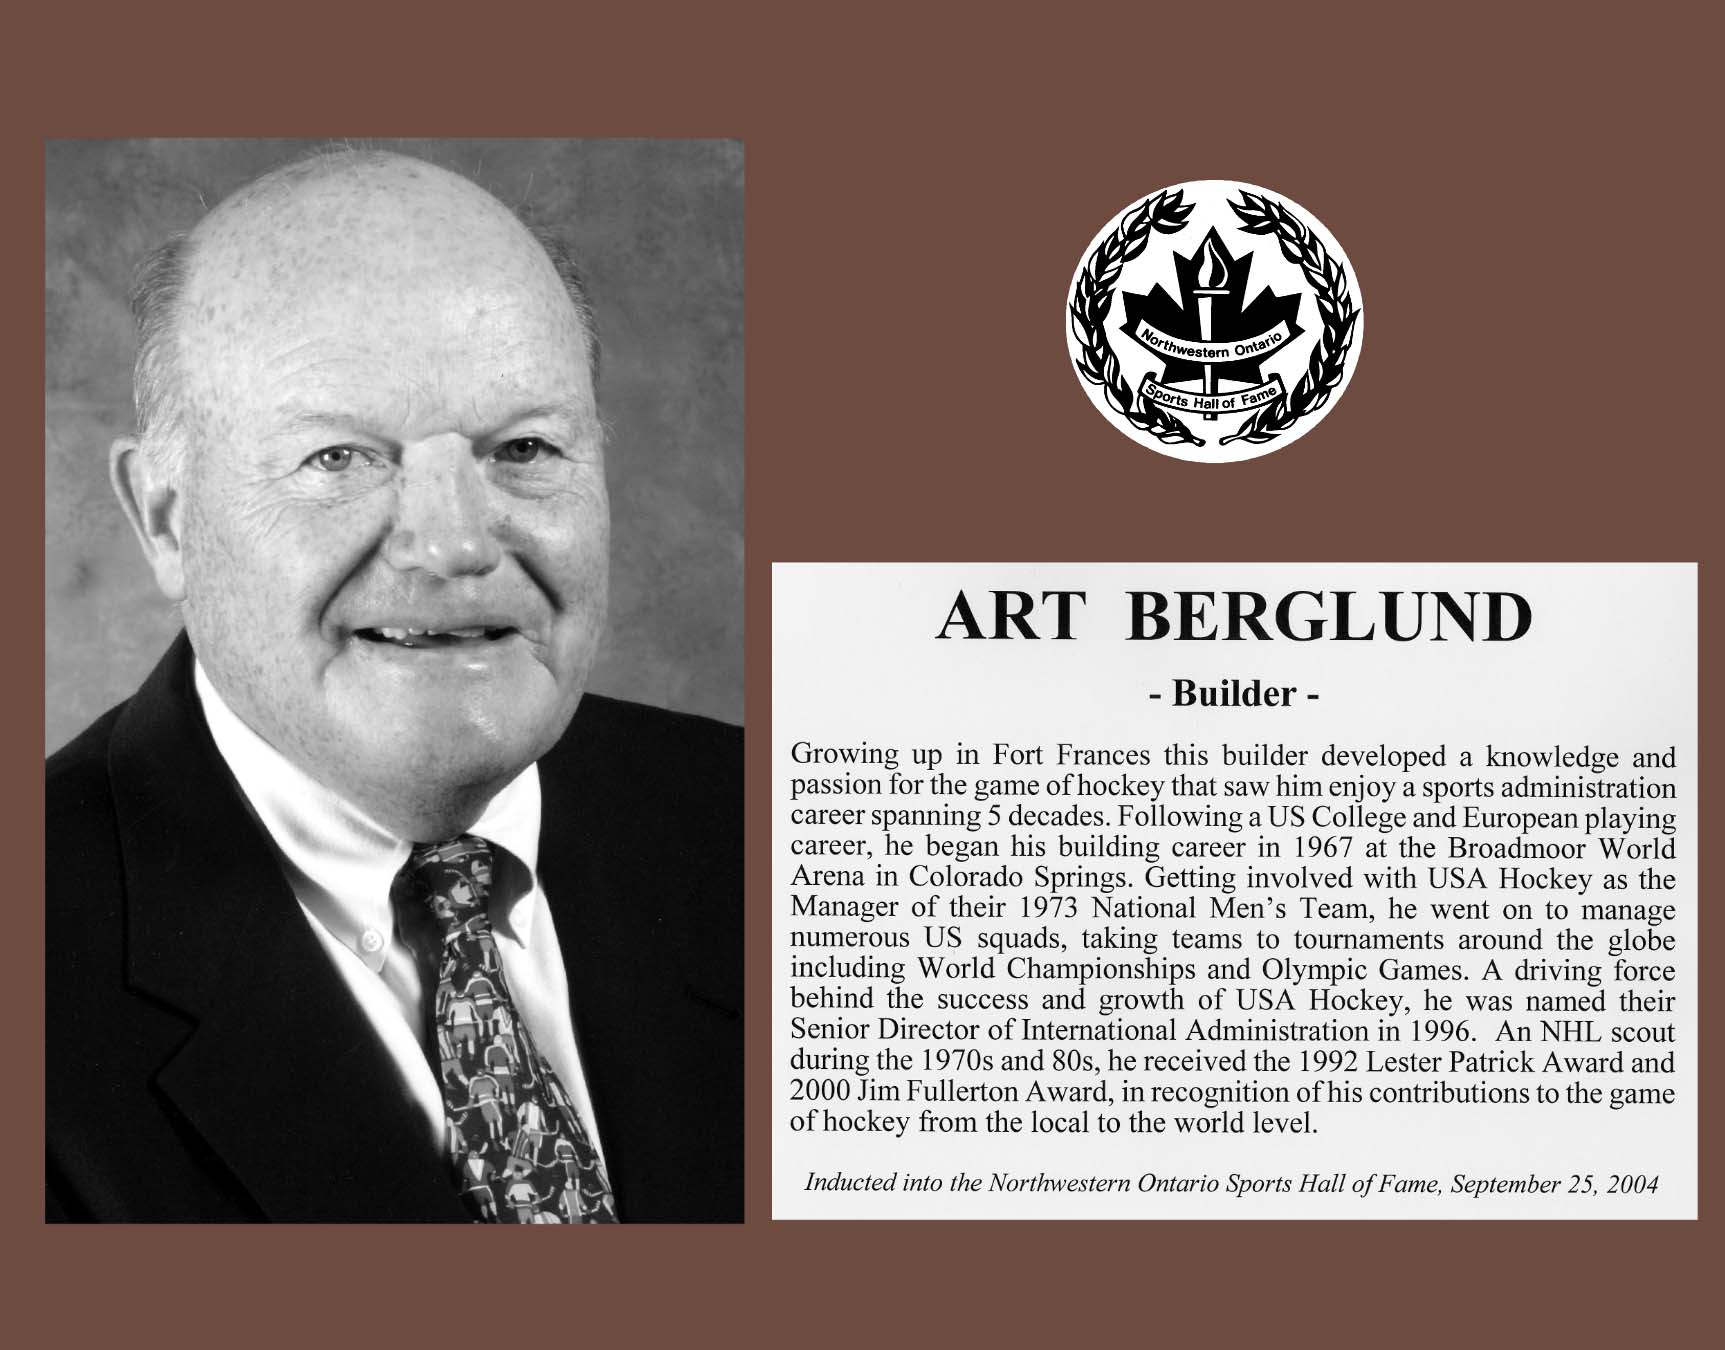 Legendary Art Berglund helped to shape hockey